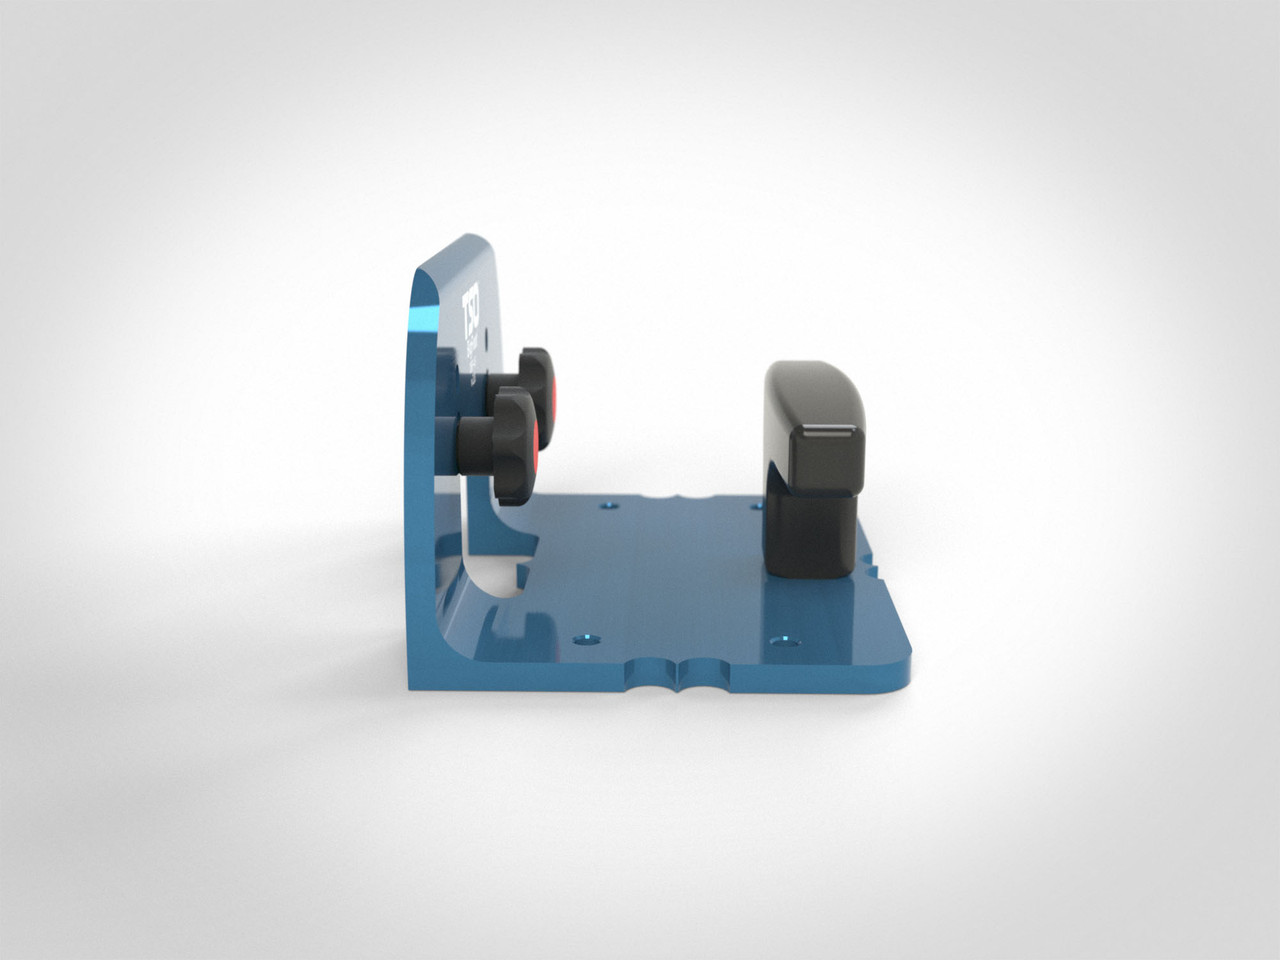 DBF-45 BigFoot v2.0 Base System for Festool Domino